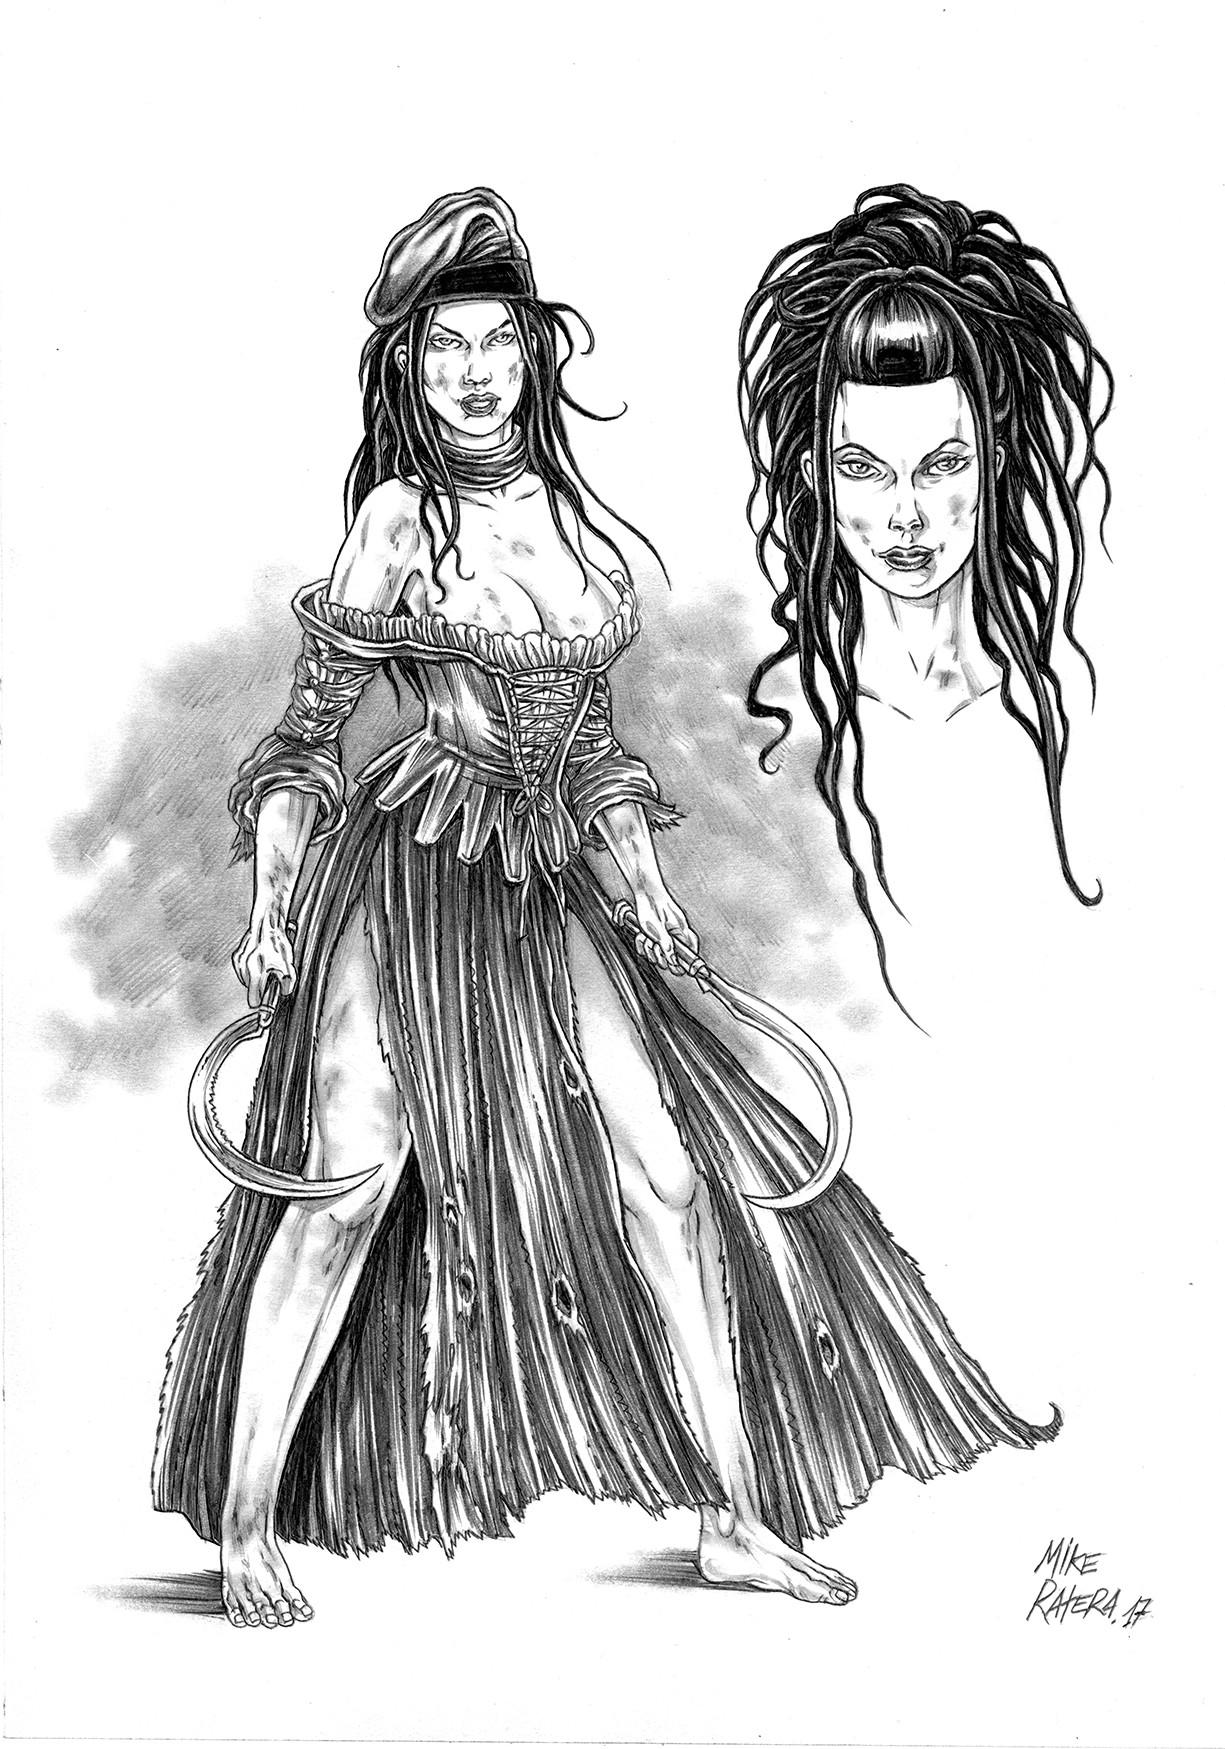 Mike ratera segadors reaper girl concept 2b